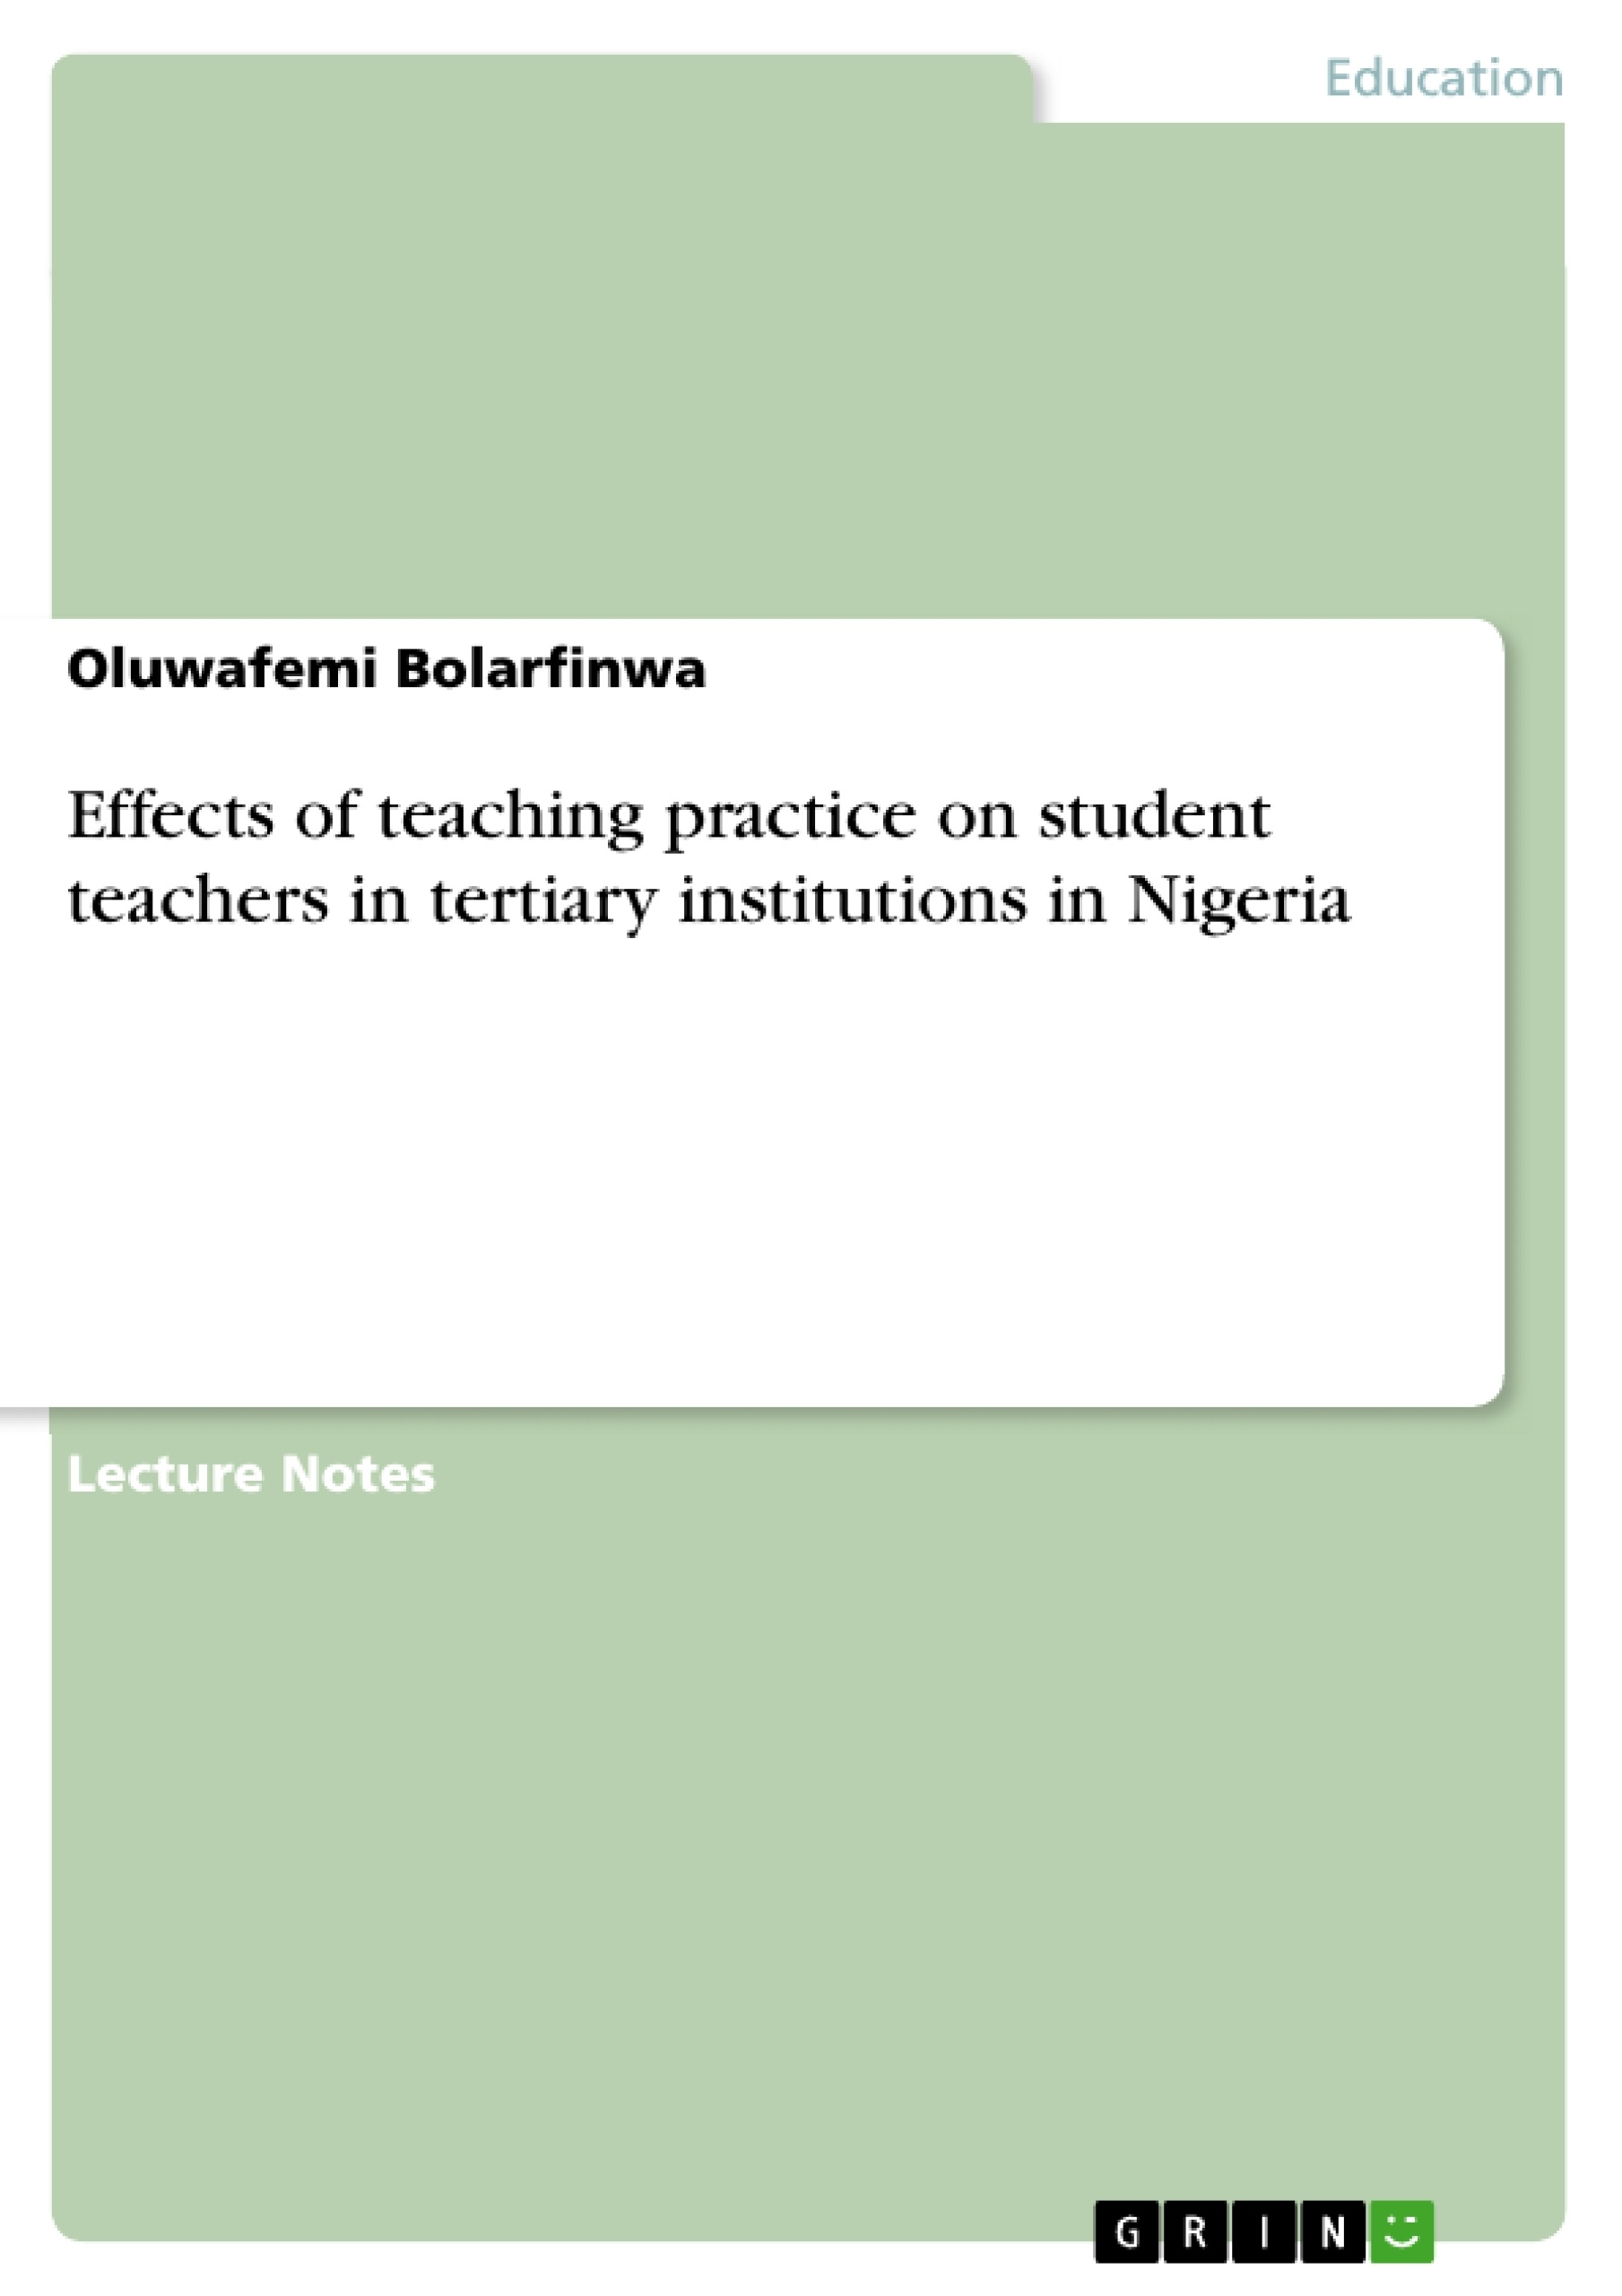 Professionalism in teaching essay